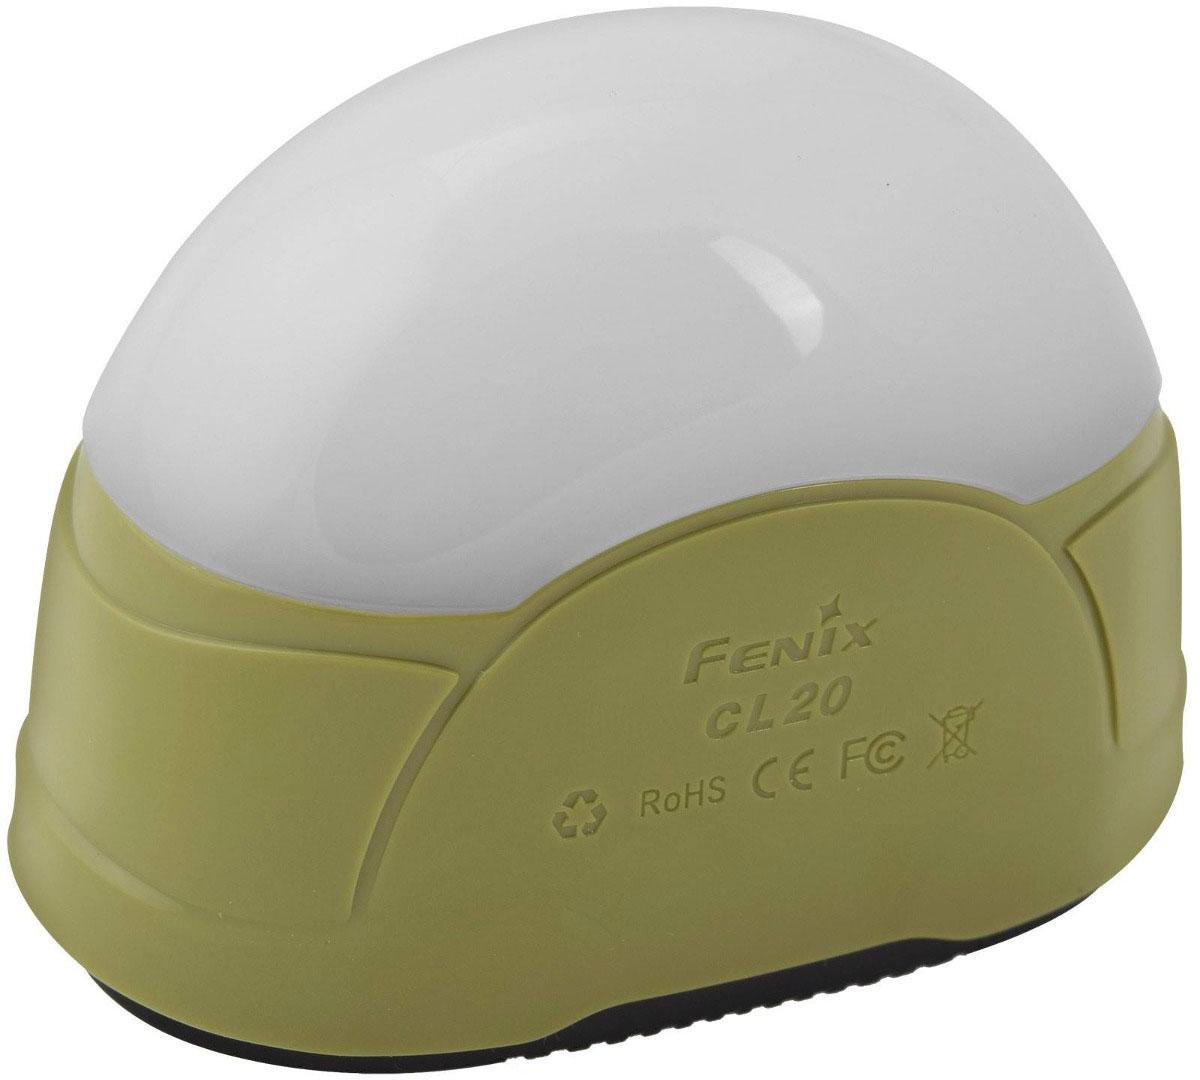 Fenix CL20 Camping Lantern (CL20o) - фонарь (Olive)